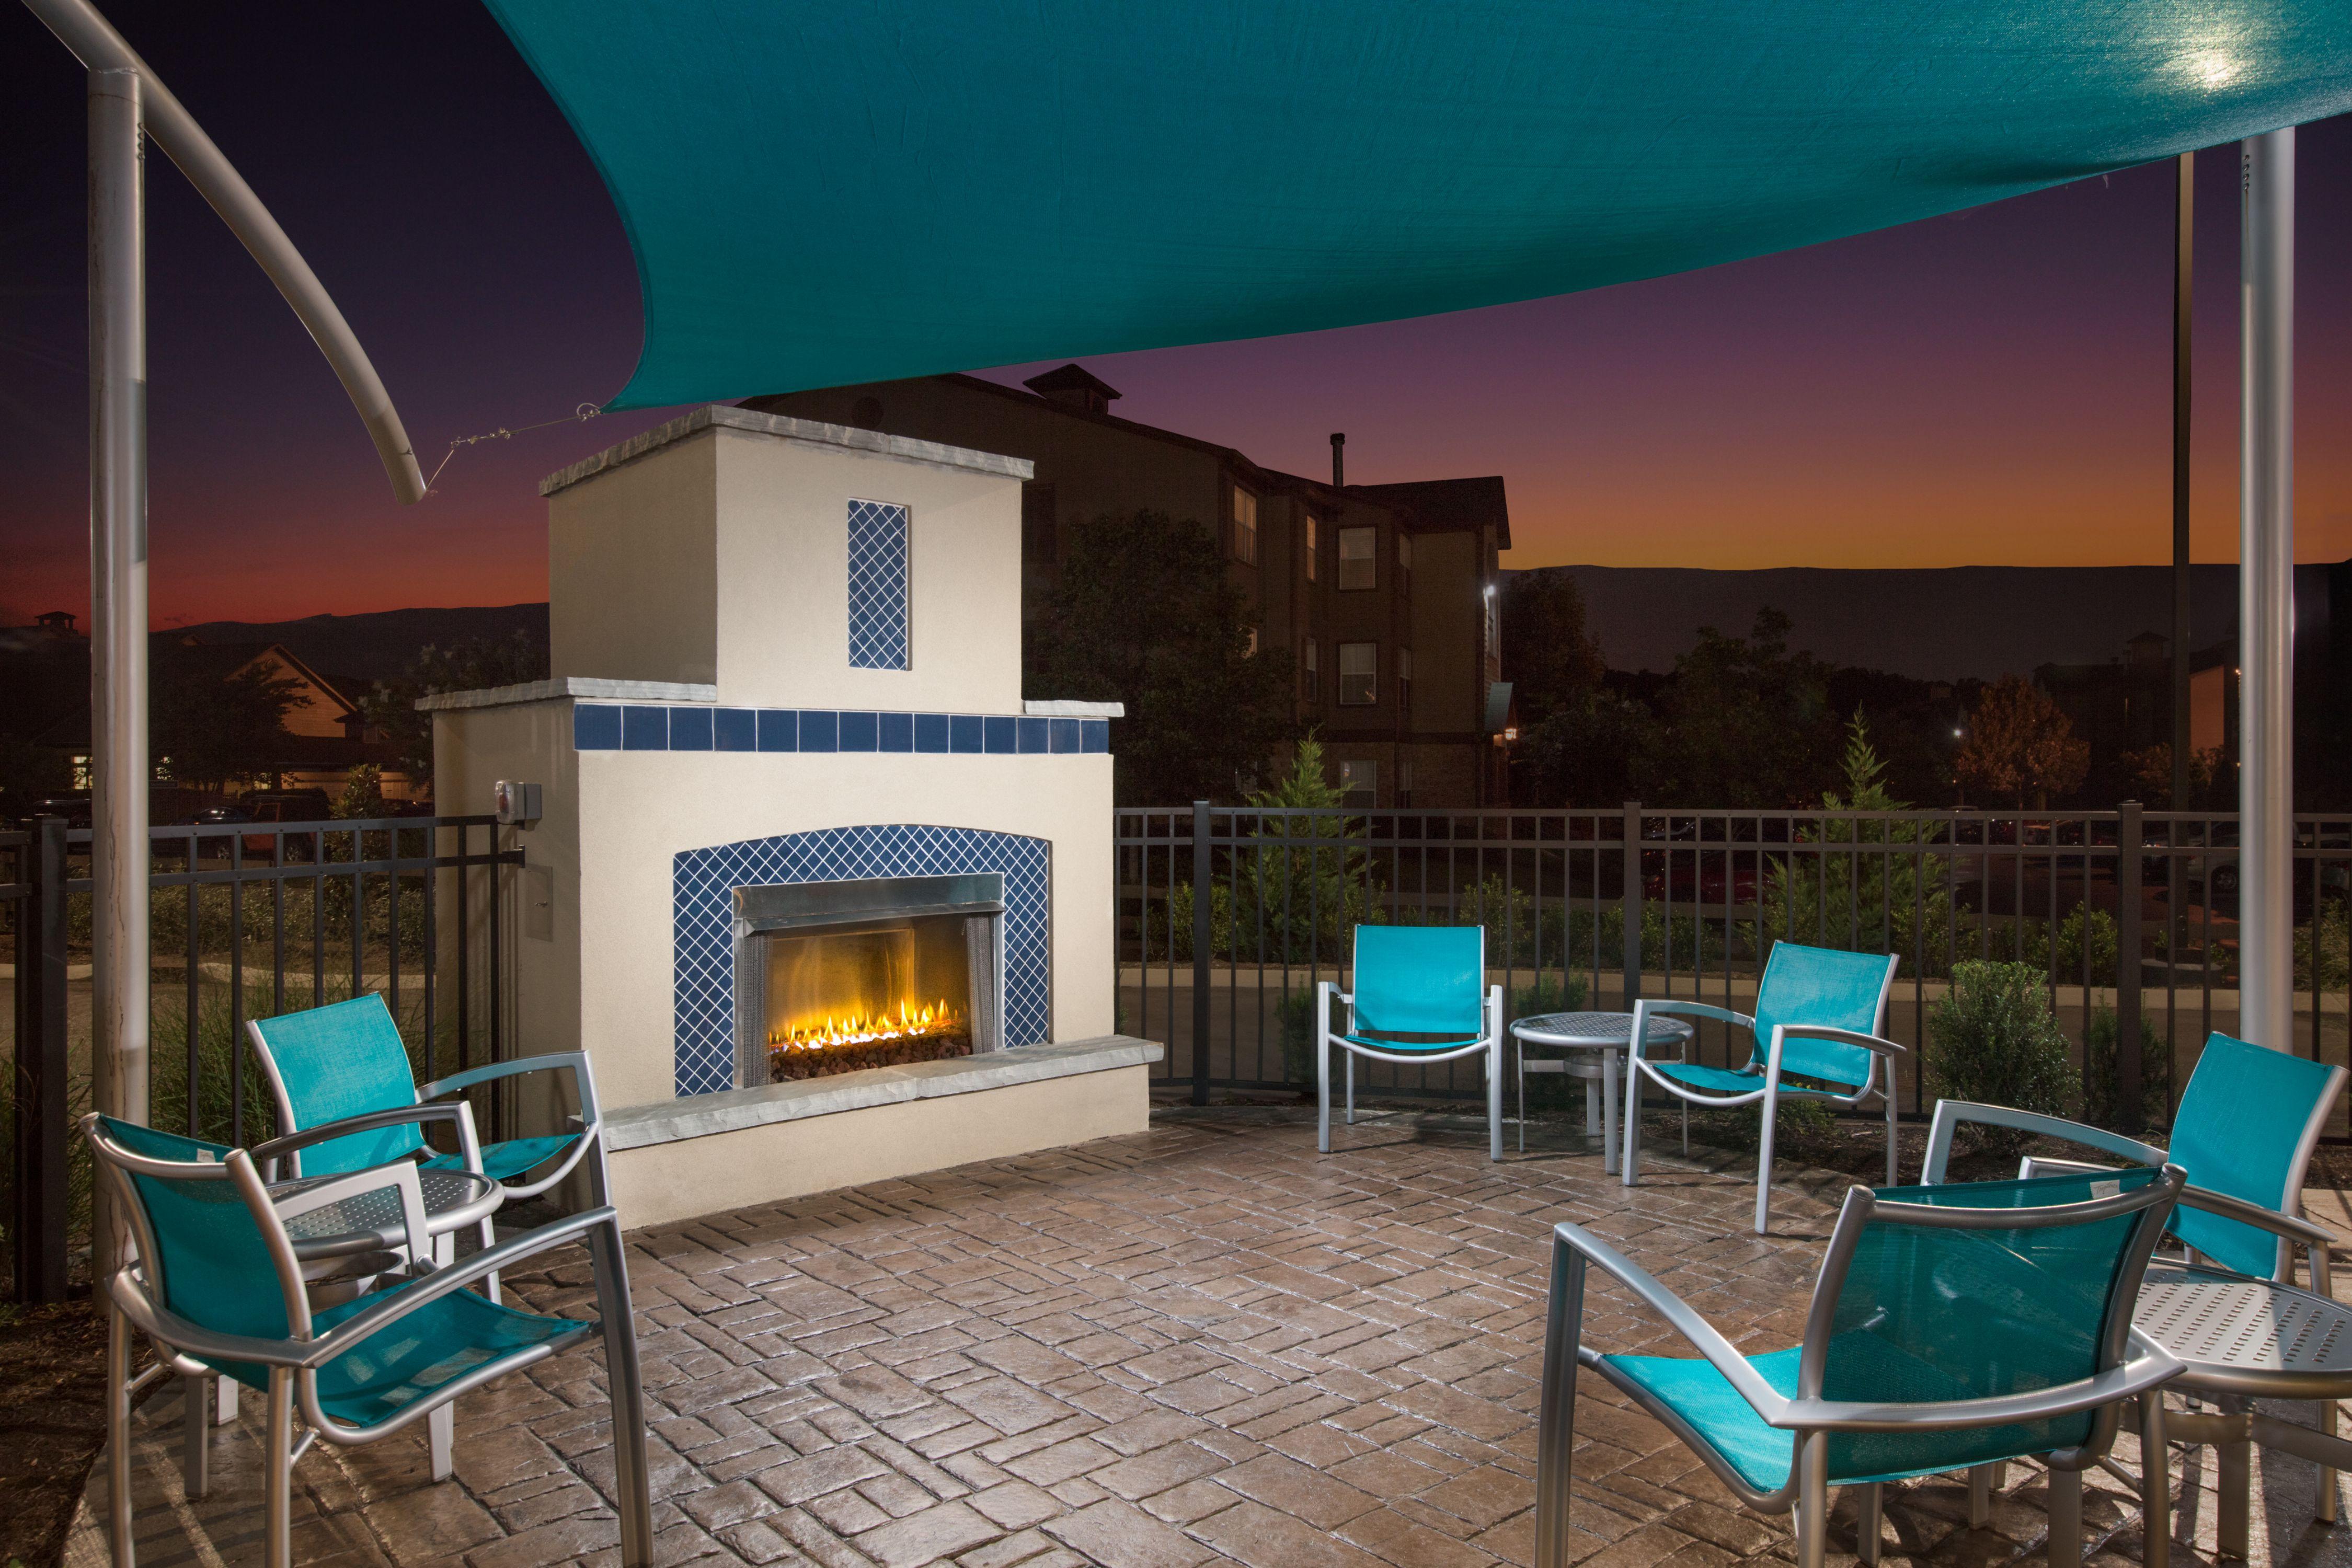 TownePlace Suites by Marriott Nashville Smyrna image 6